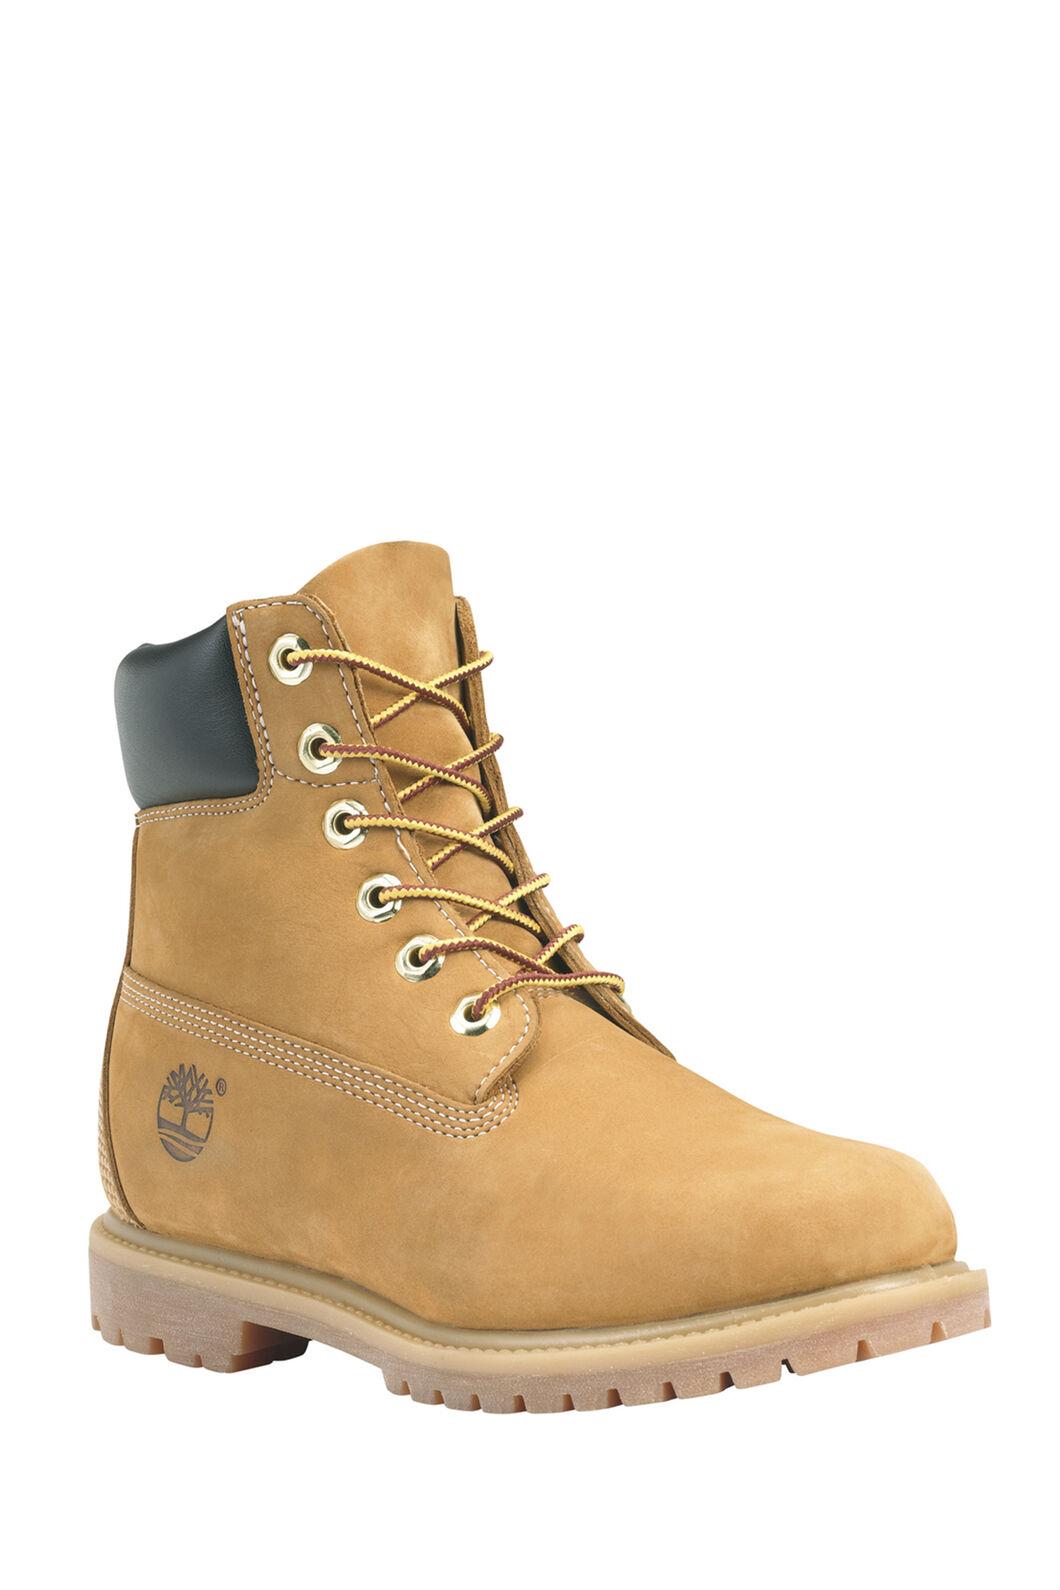 Timberland 6-Inch Premium WP Boots — Women's, WHEAT WATERBUCK, hi-res